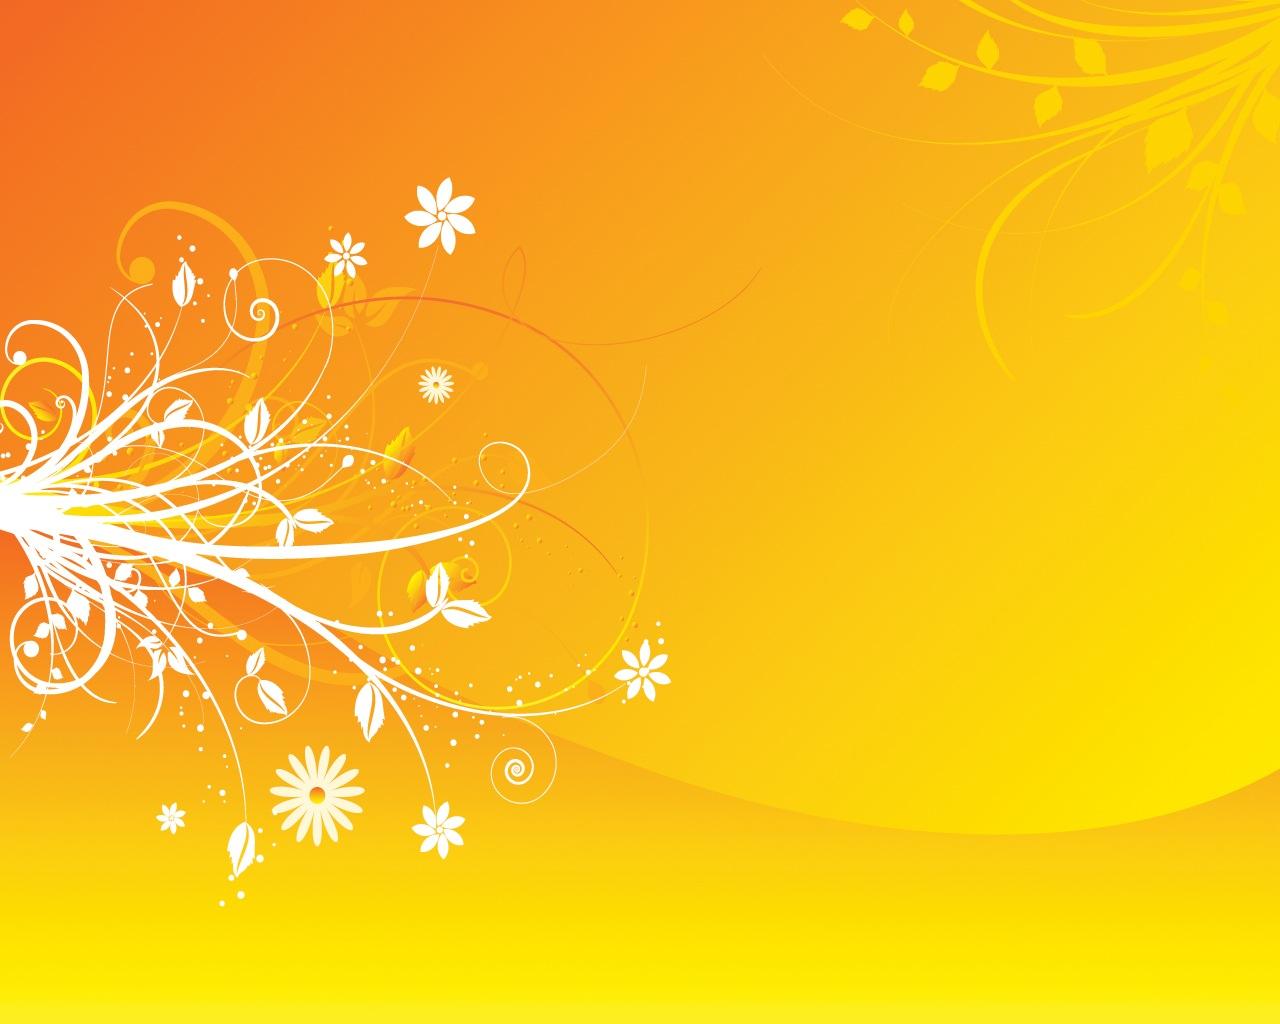 http://3.bp.blogspot.com/-FORYQLYjx7k/Twtd94_4dCI/AAAAAAAAAFM/9ZPevovyQns/s1600/1584-orange-flower-vector-wallpaper-1280x1024-customity.jpg